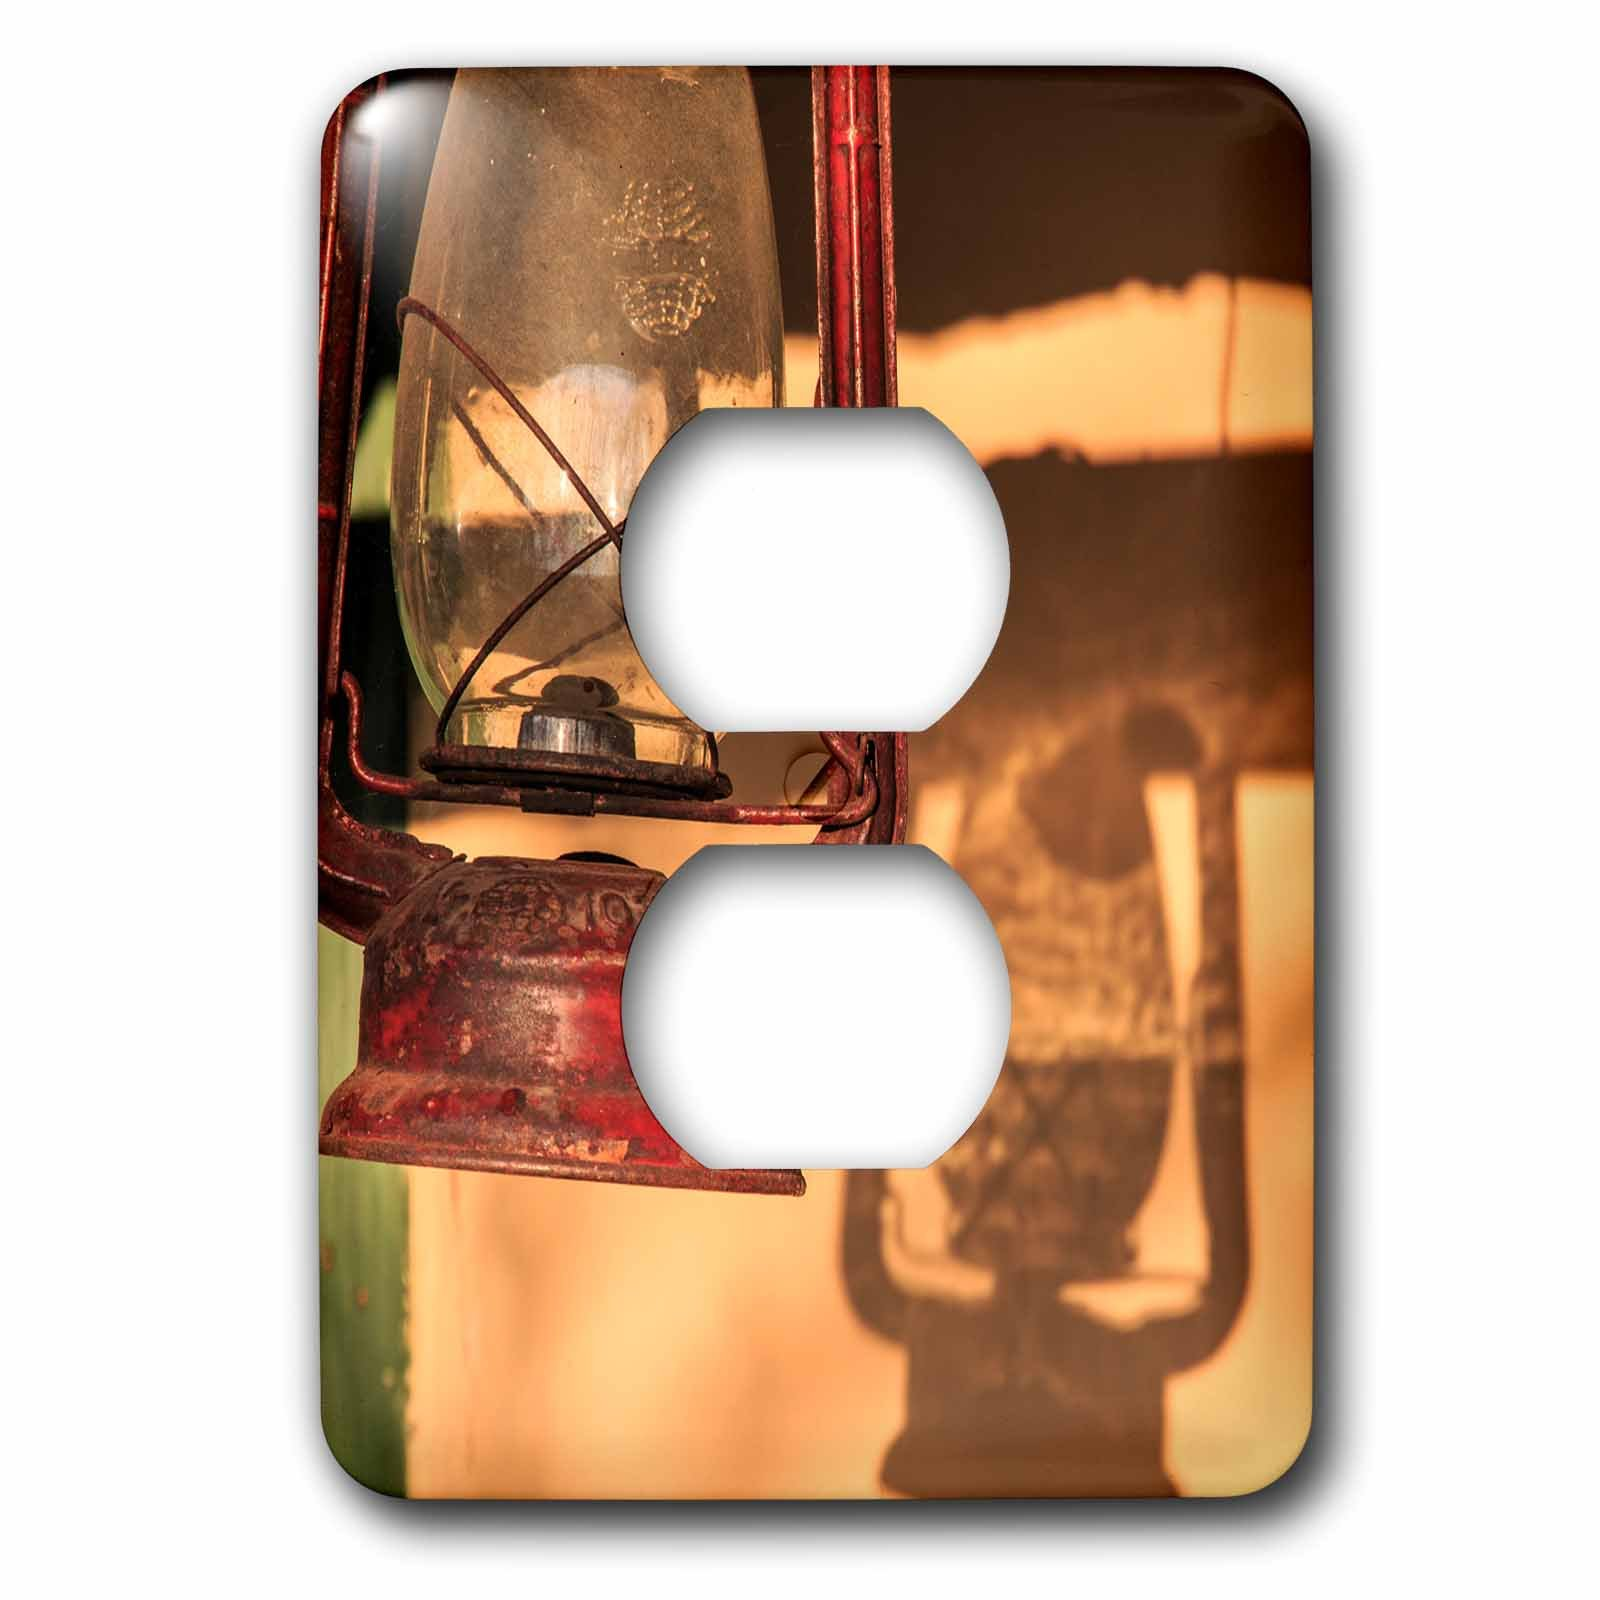 3dRose Danita Delimont - Lamps - Romania, Maramures, Baia Spire, Pottery workshop. Lantern. - Light Switch Covers - 2 plug outlet cover (lsp_277879_6)